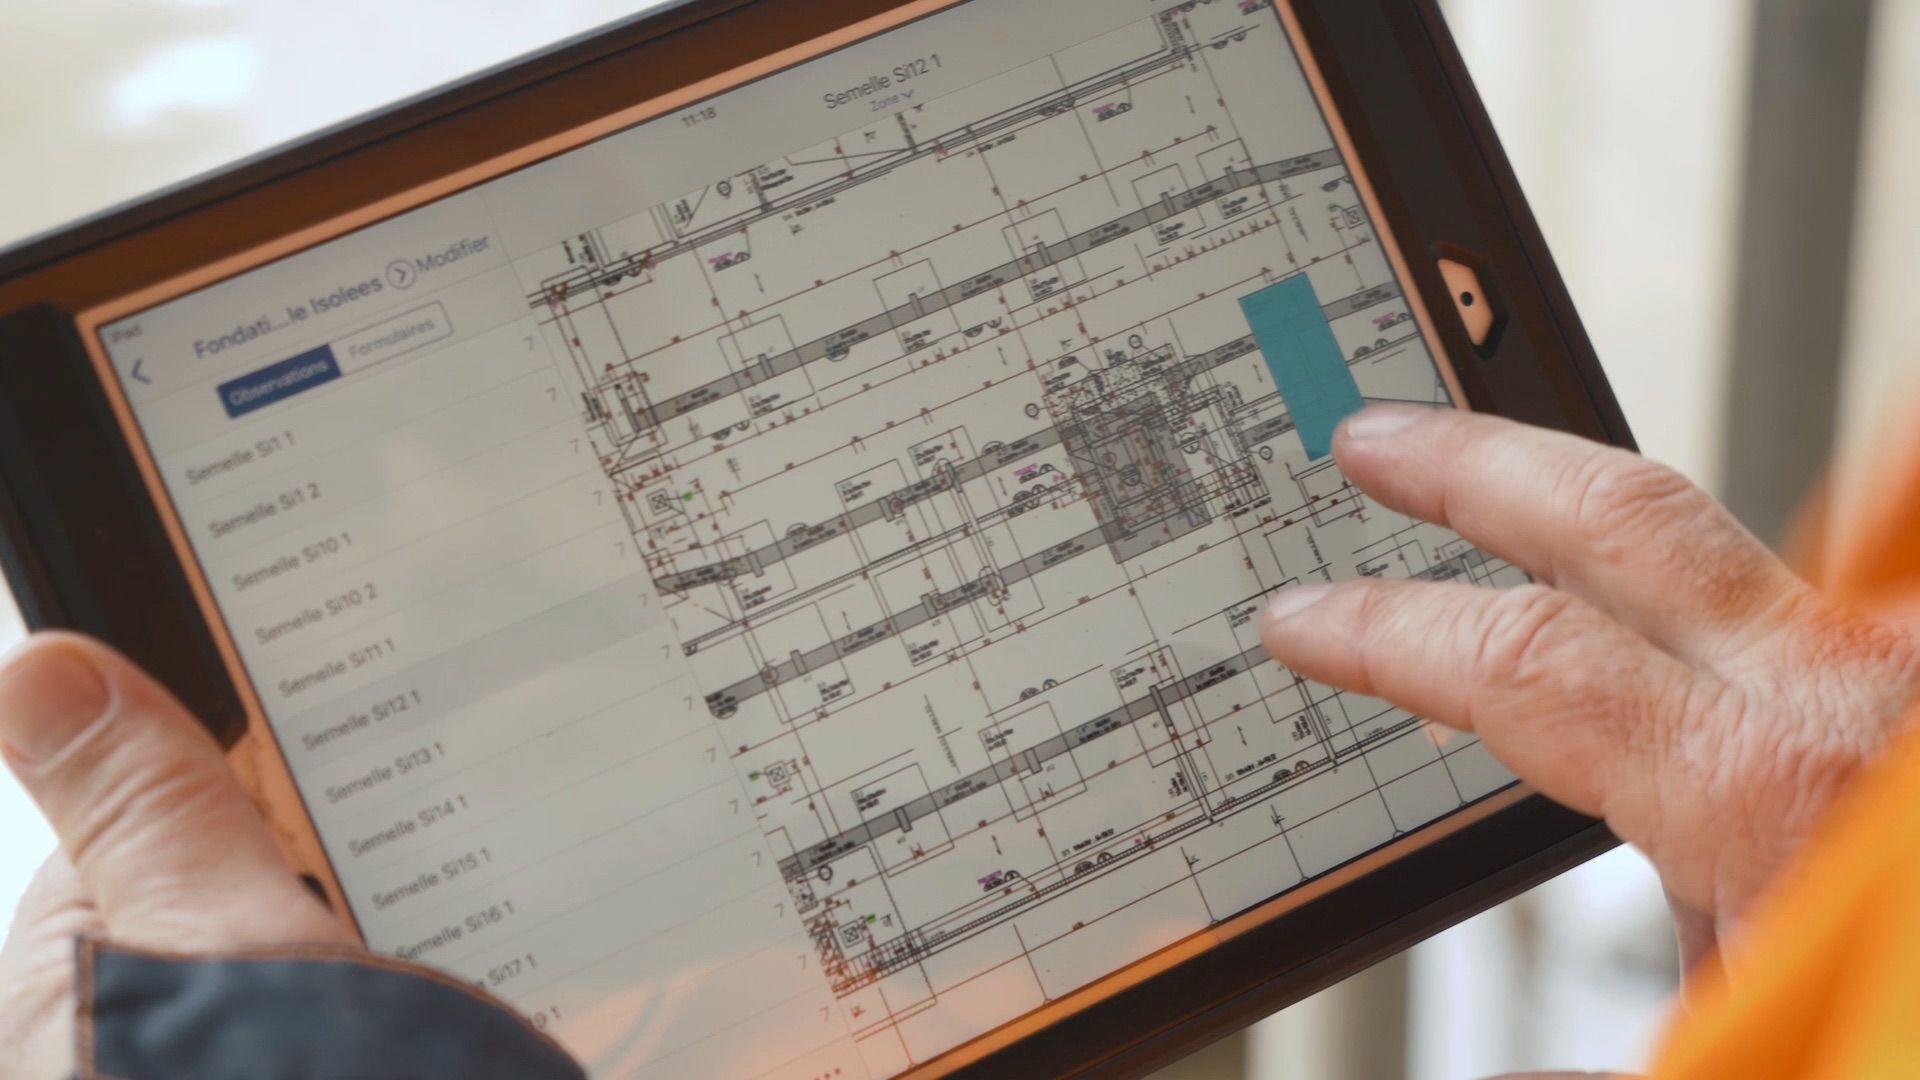 tralux_tablet.jpg